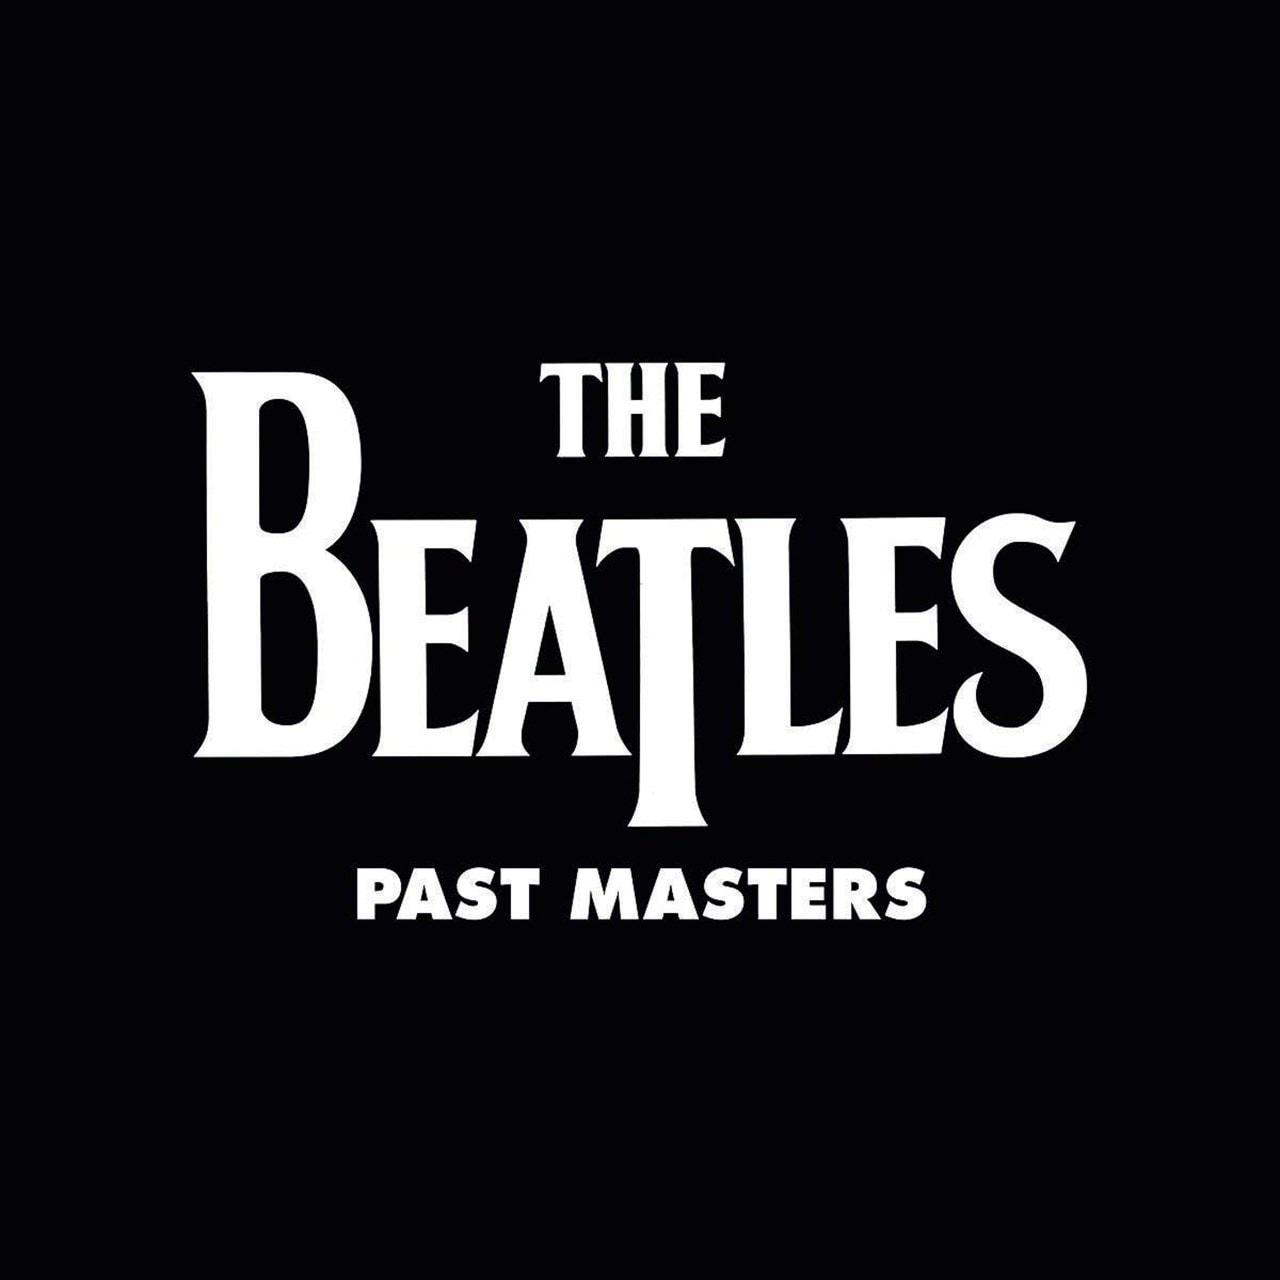 Past Masters - Volume 1 & 2 - 1